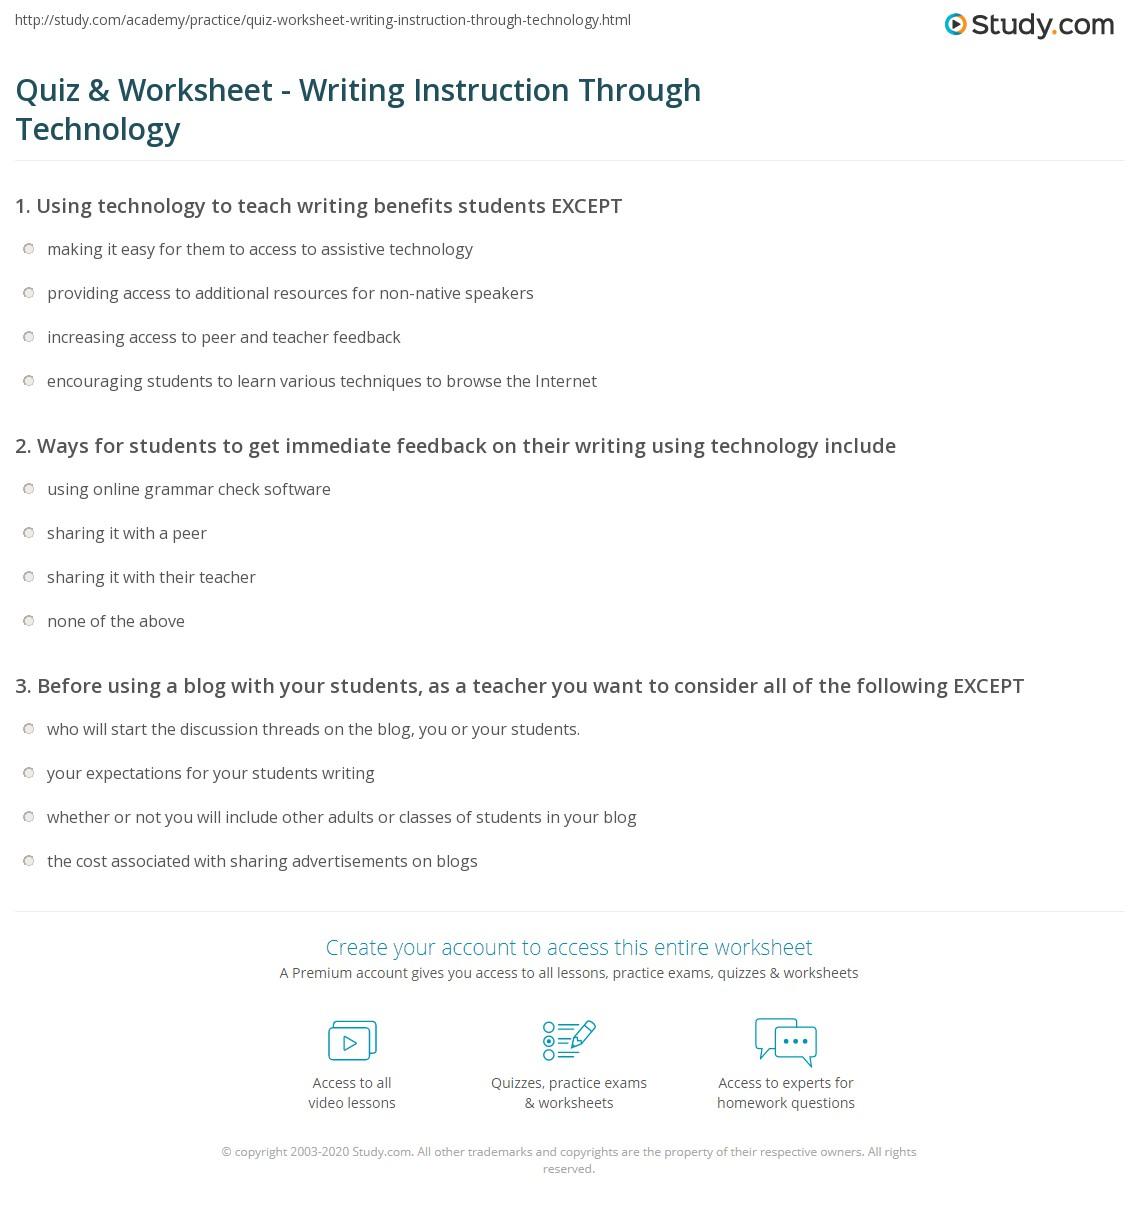 worksheet Technology Worksheets quiz worksheet writing instruction through technology study com print using to teach worksheet